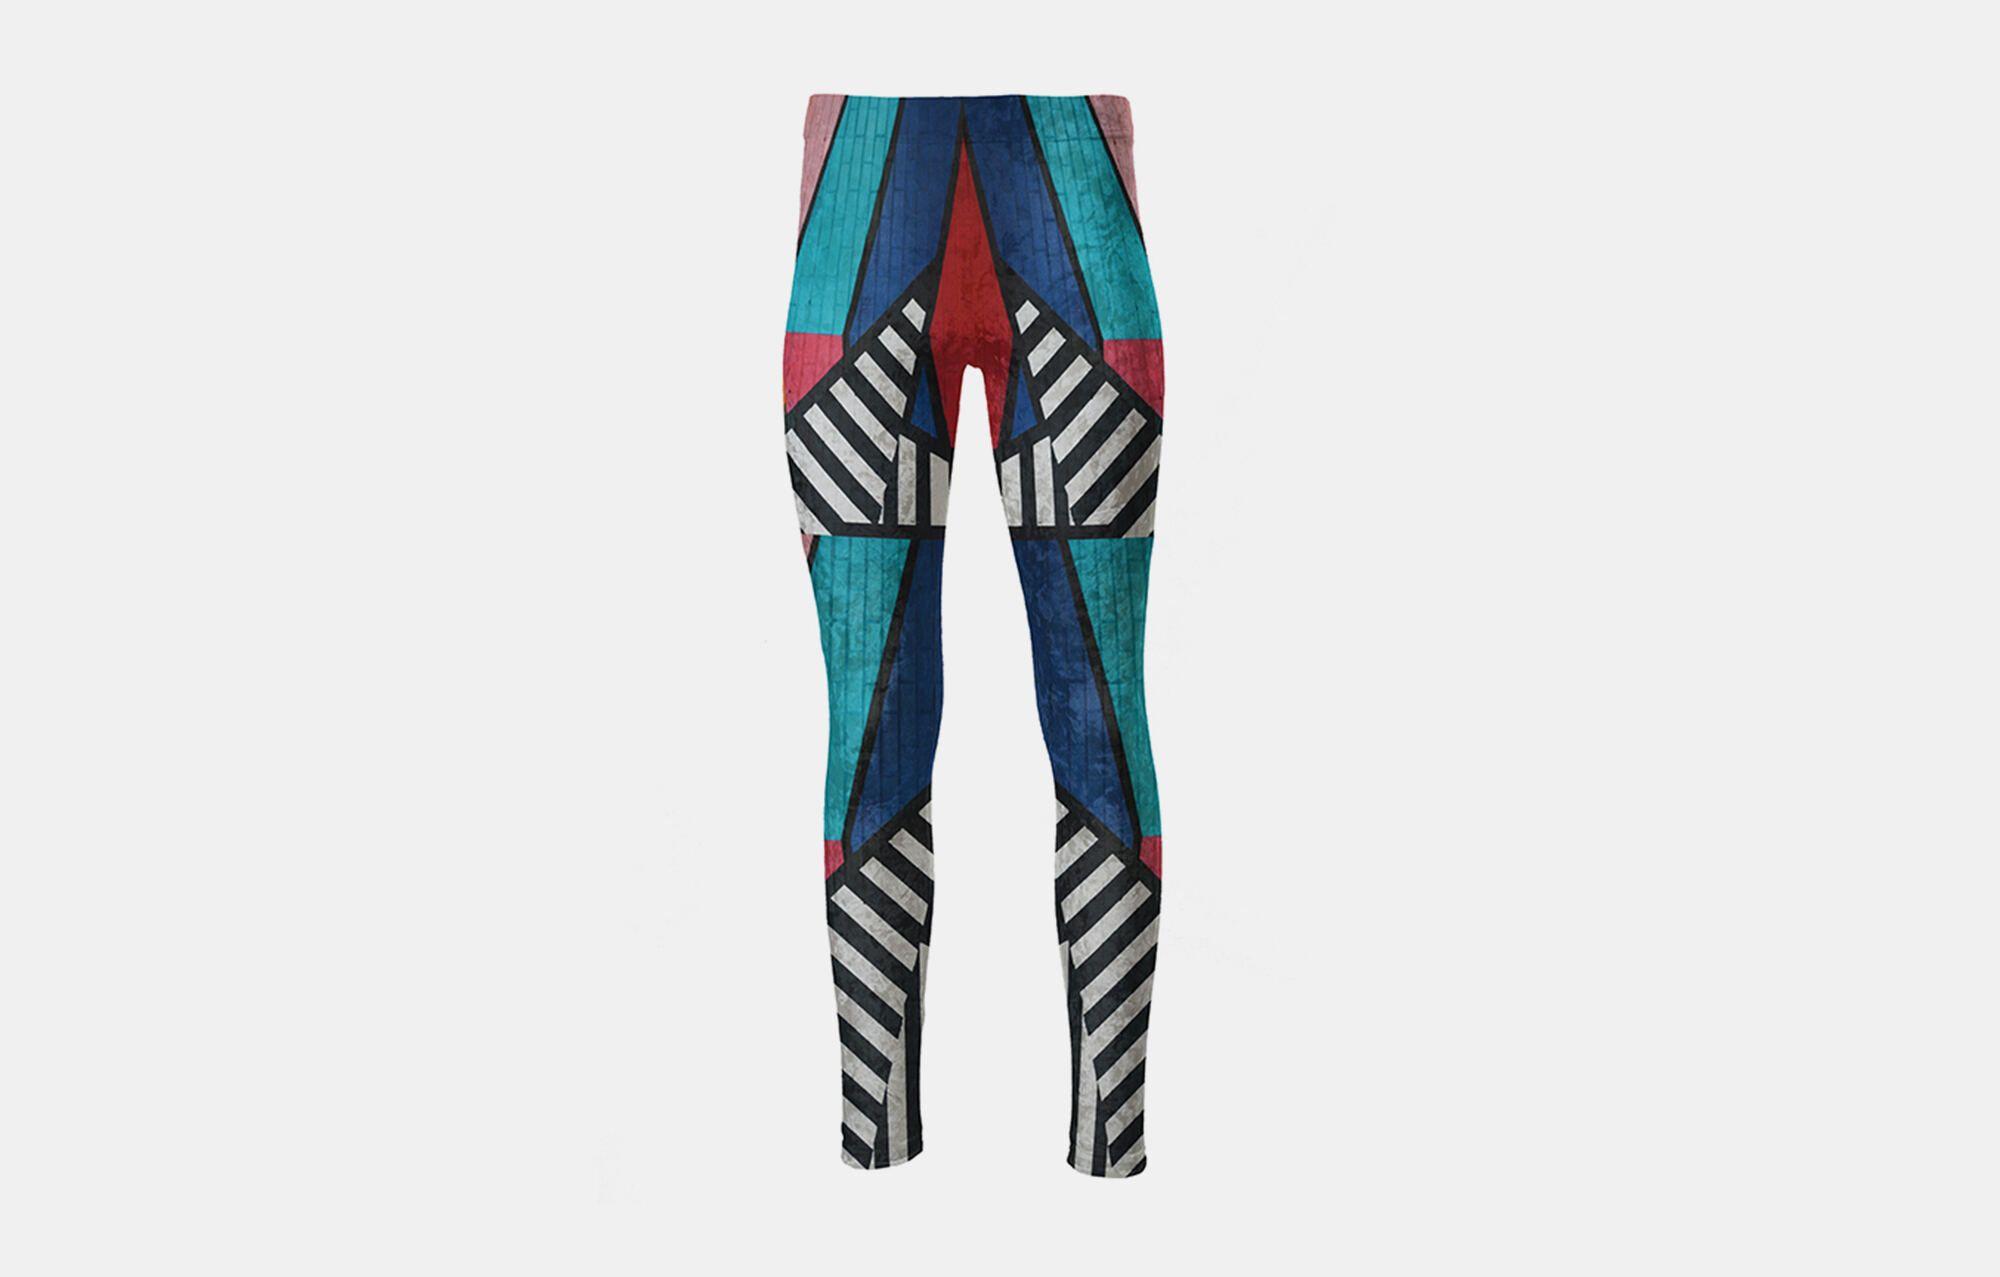 womens trousers leggings